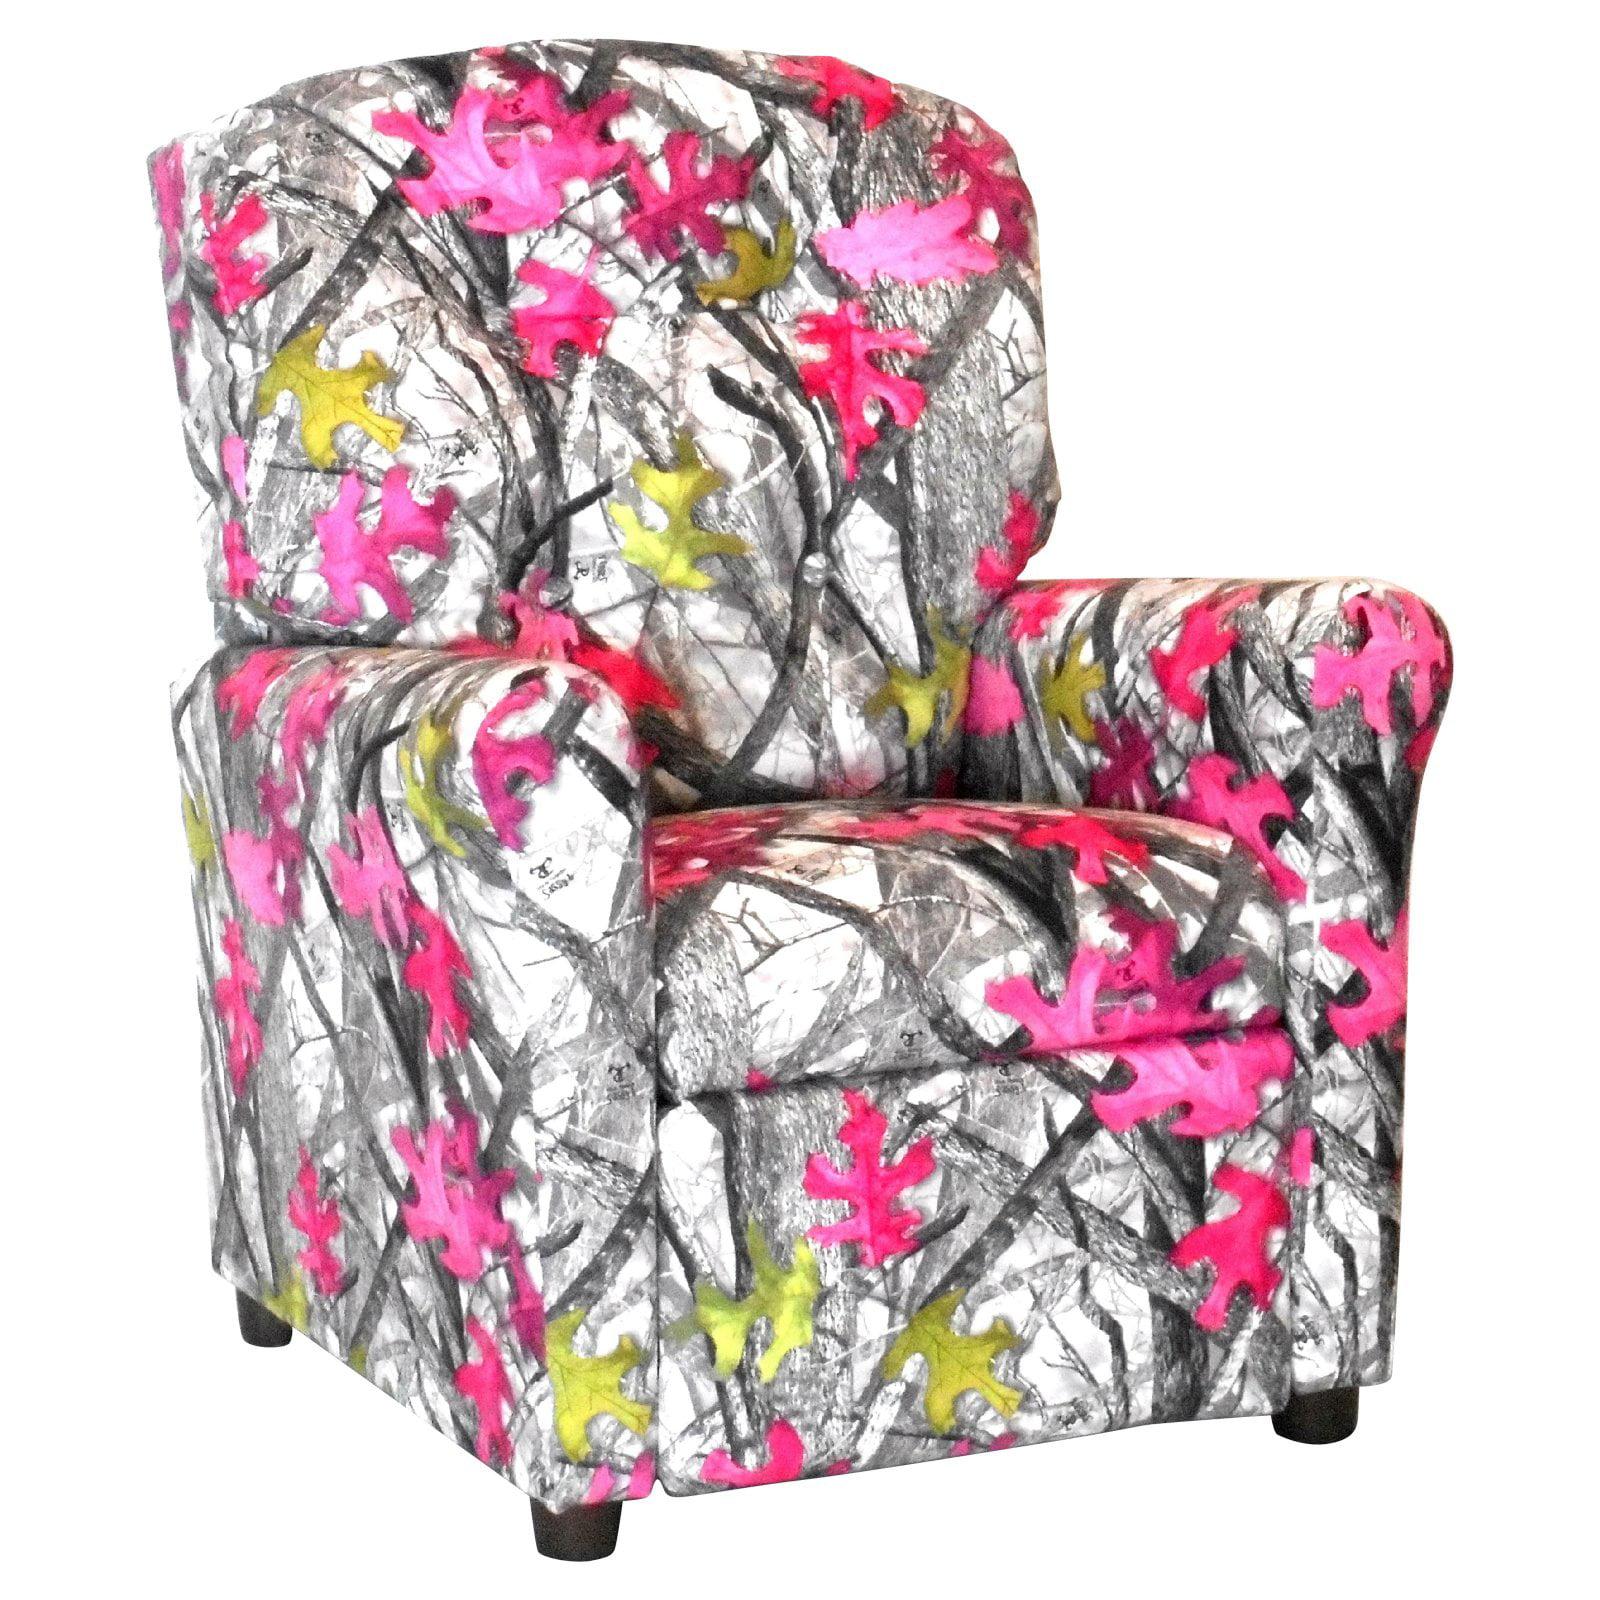 Brazil Furniture 4-Button Back Child Recliner - Sassy Camo Gray